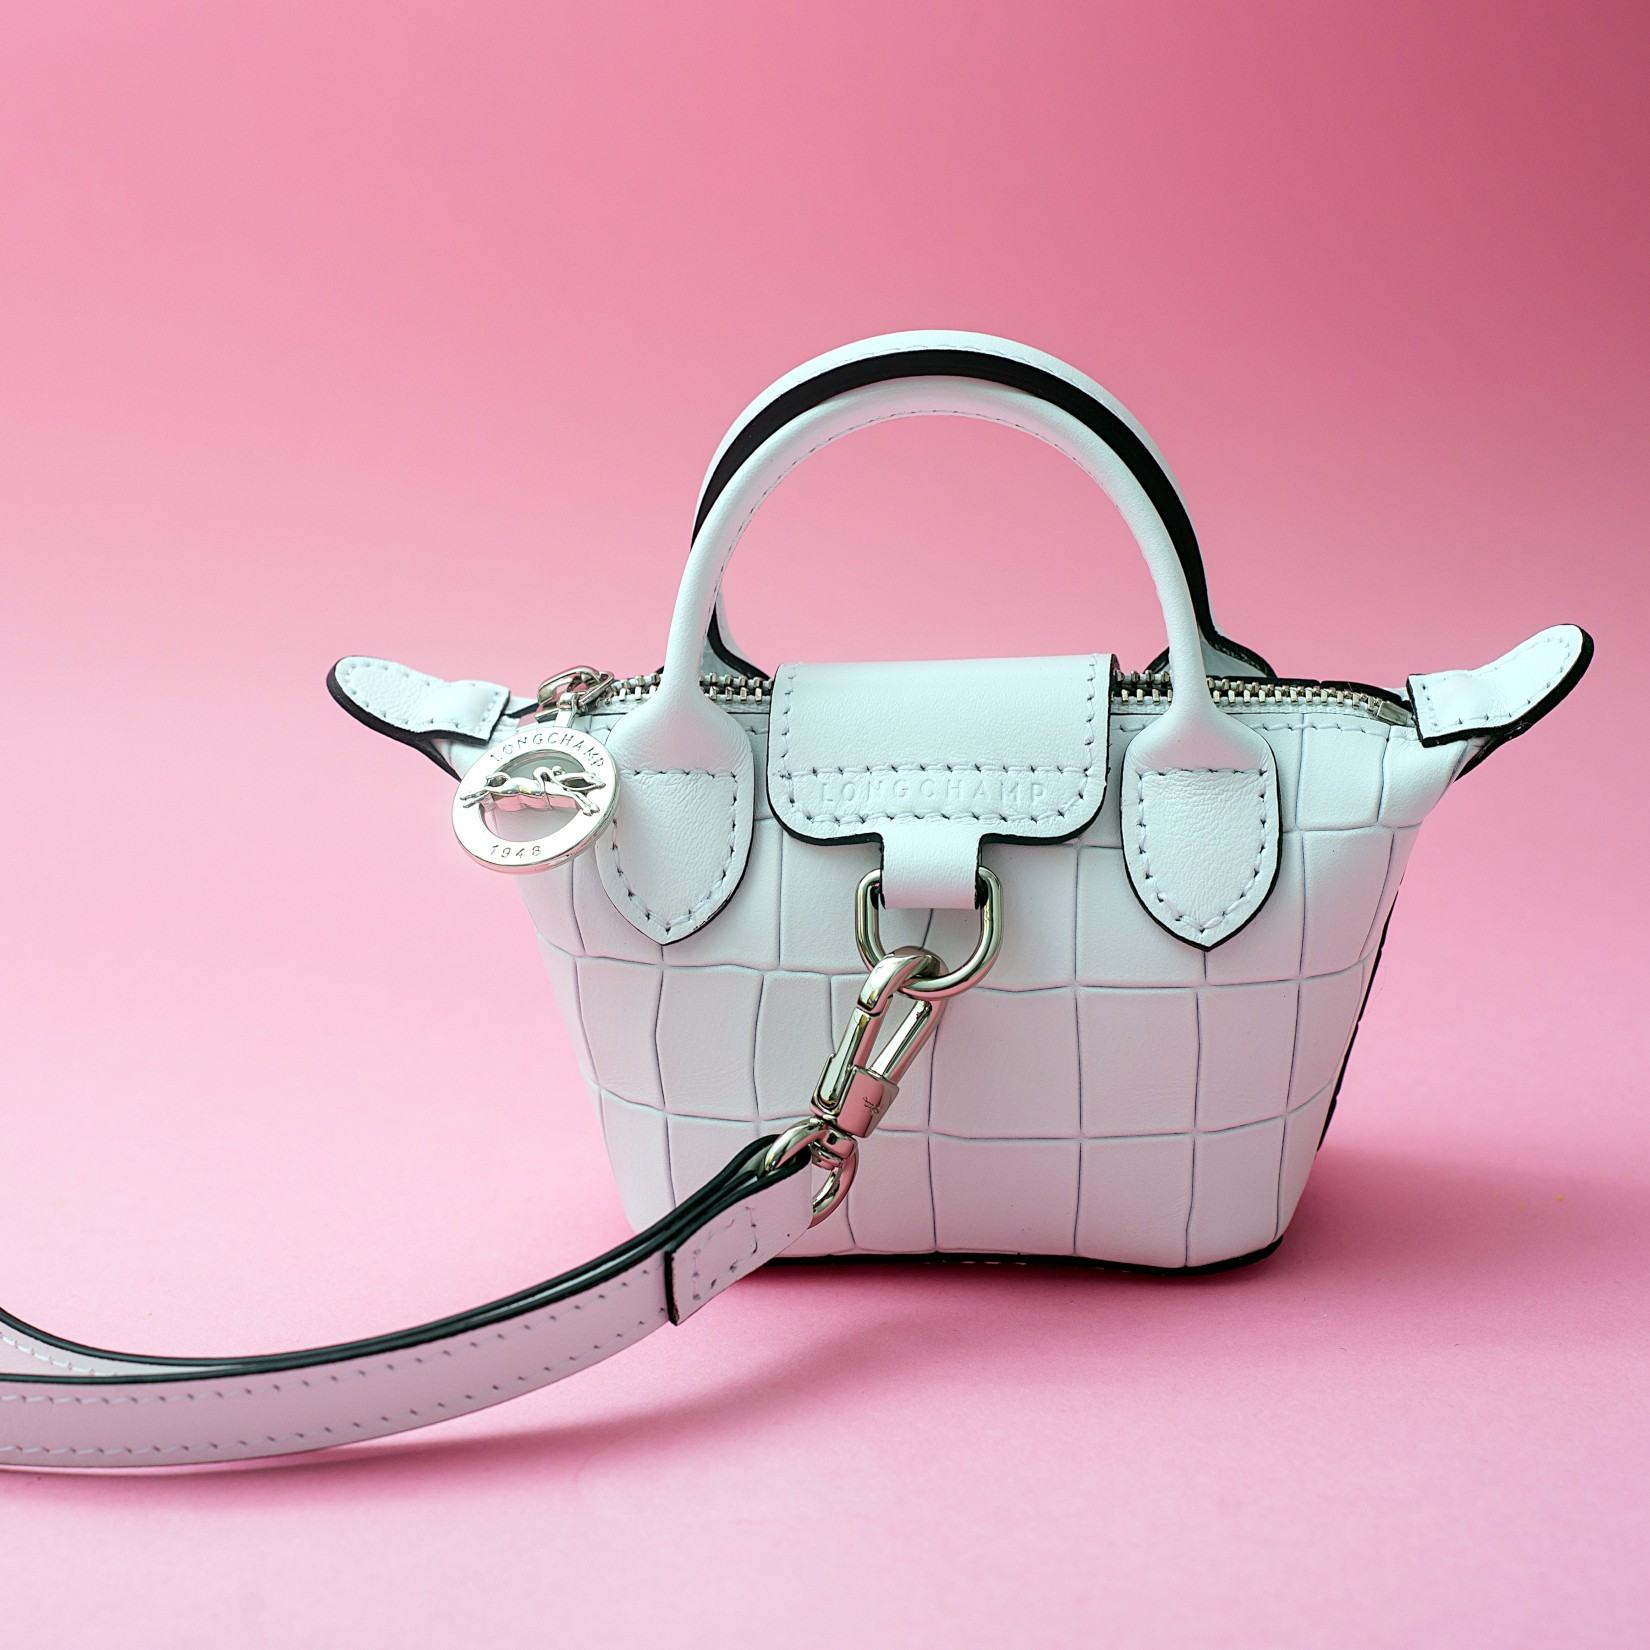 La tendance mini-sac: comment la porter